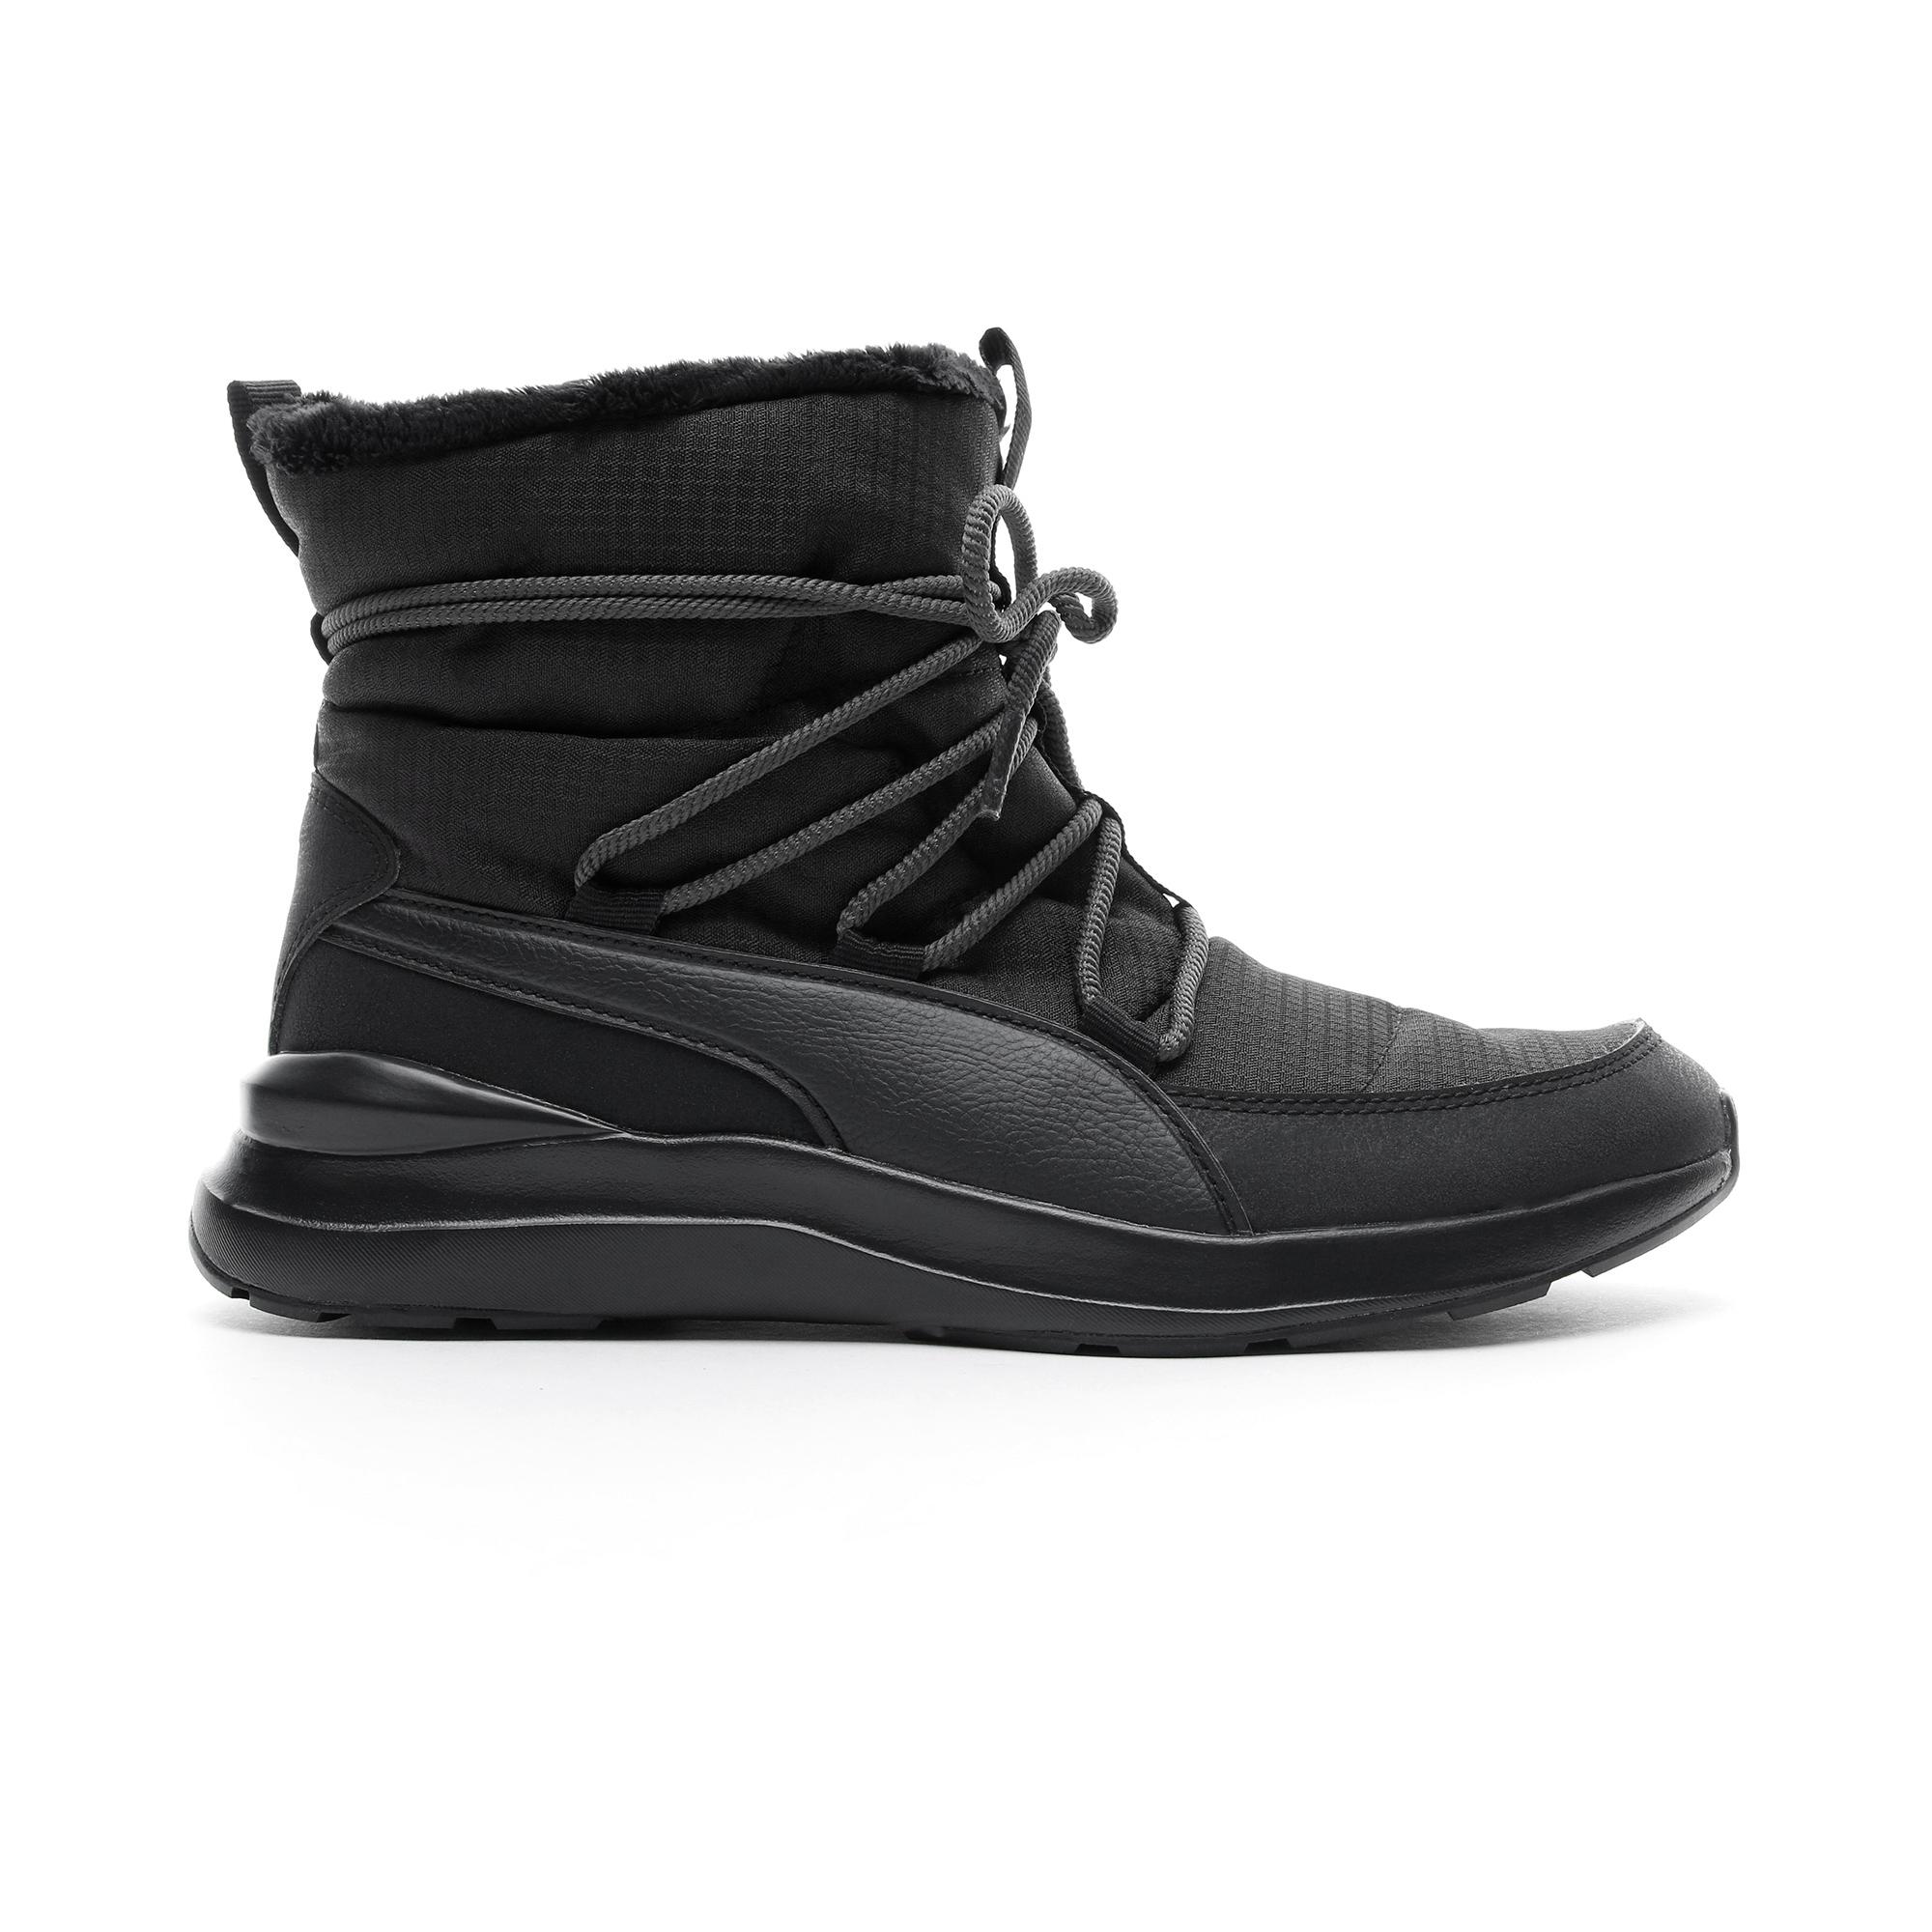 concept nou aspect minunat calitate Puma Adela Winter Boot Kadın Siyah Bot Kadin Bot & Çizme 3471114 ...